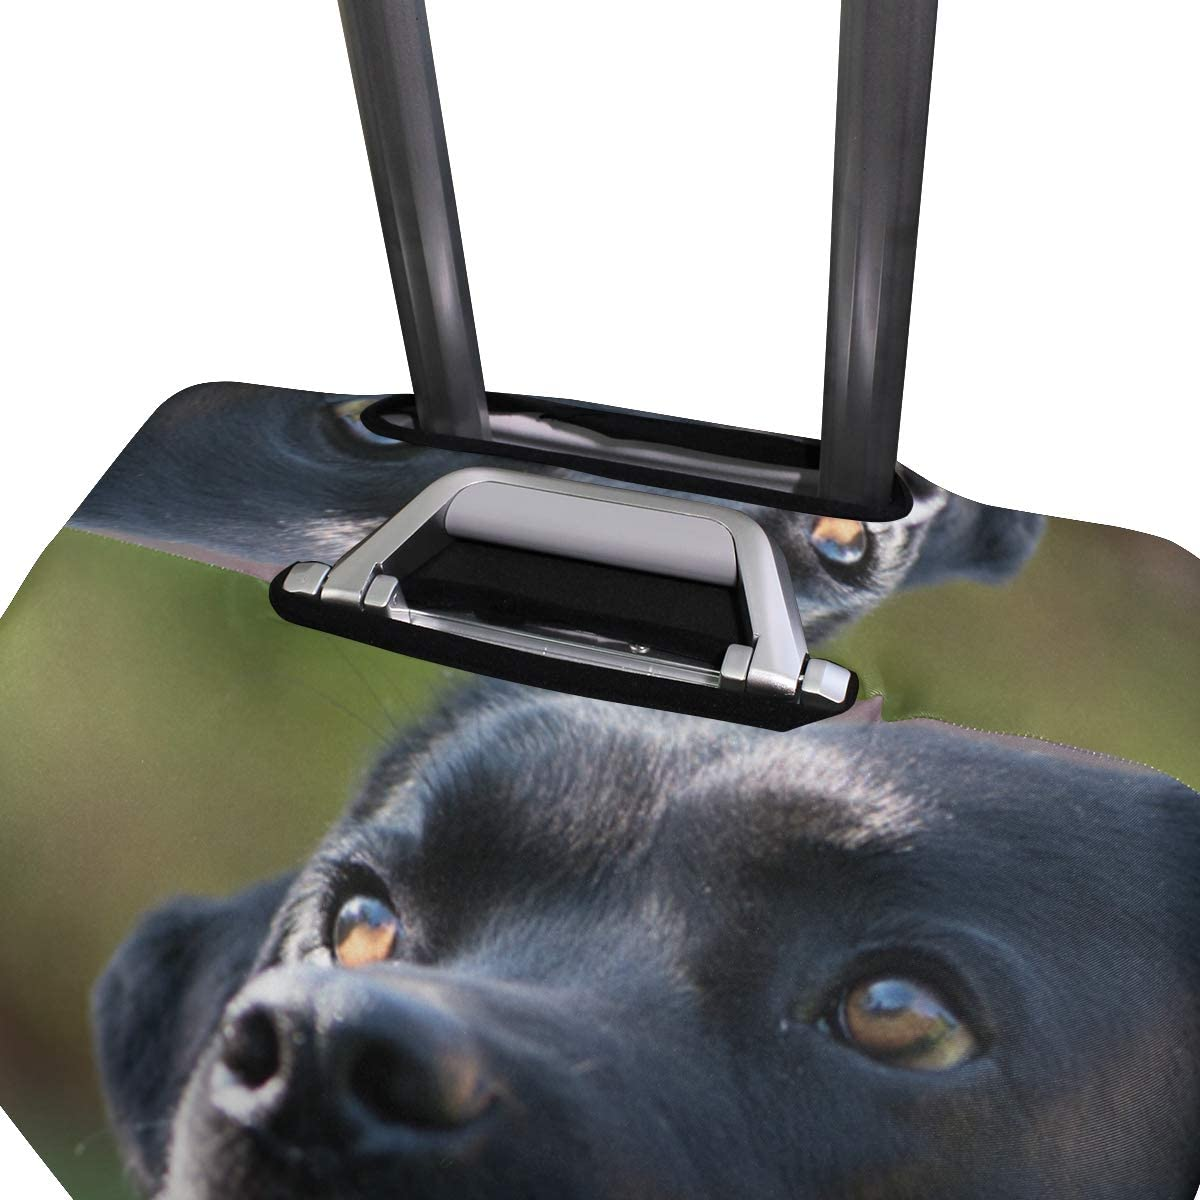 Travel Luggage Cover Labrador Black Pet Strange Suitcase Protector